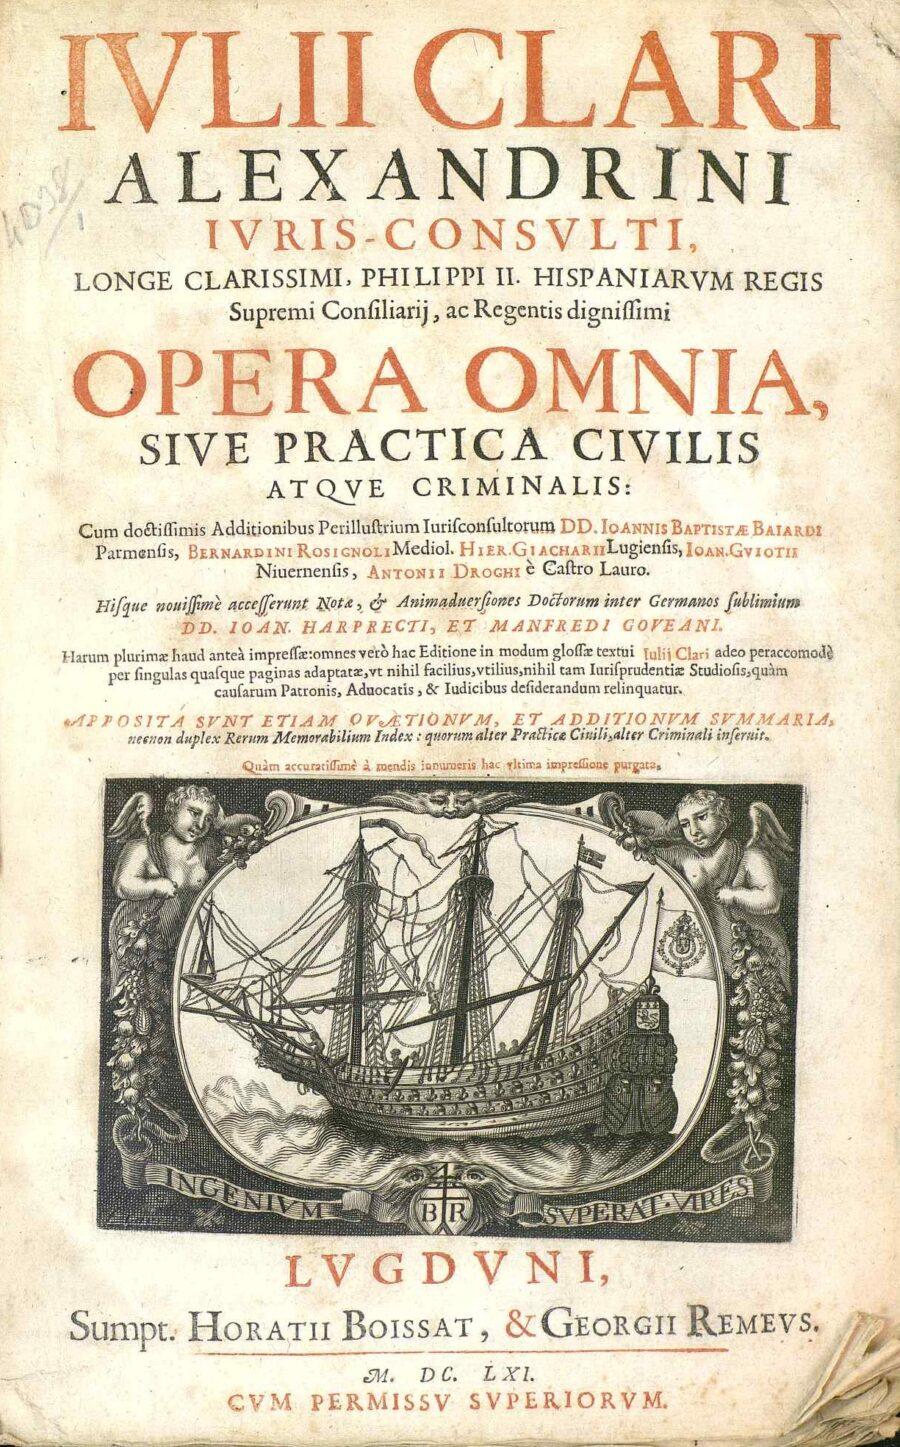 6 Gennaio 1625 – Nasce Giulio Claro